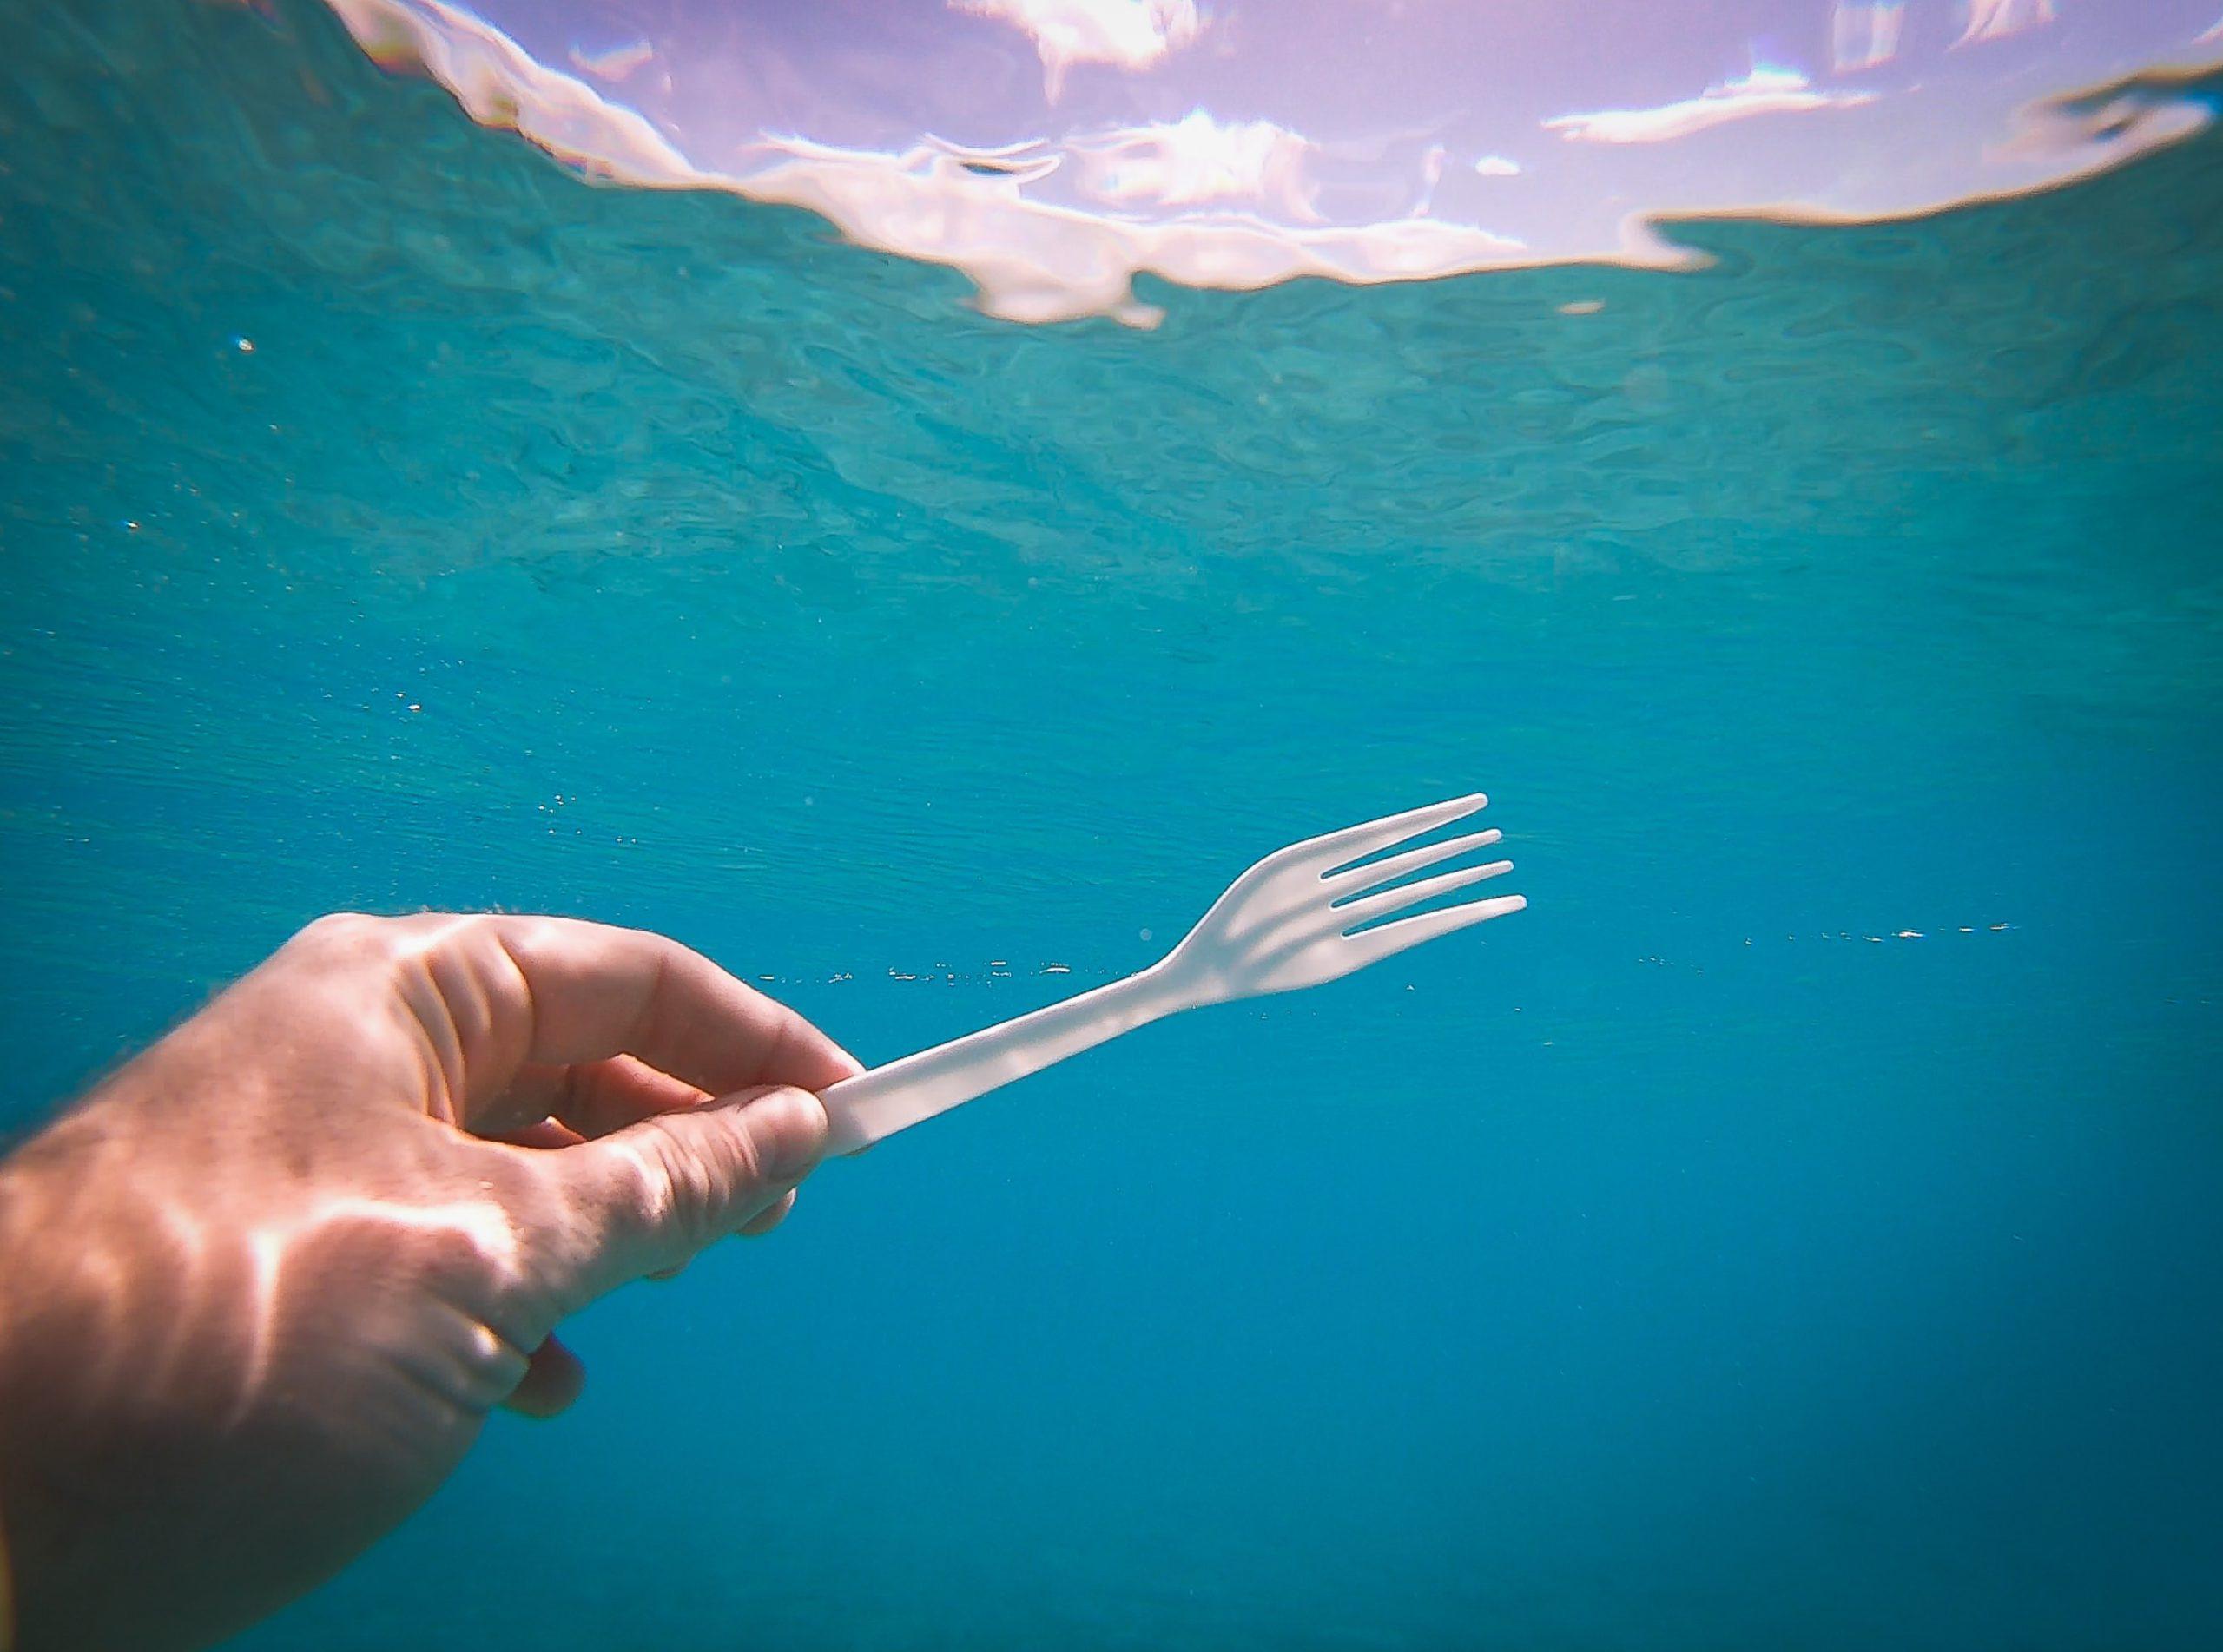 Imports of single-use plastics